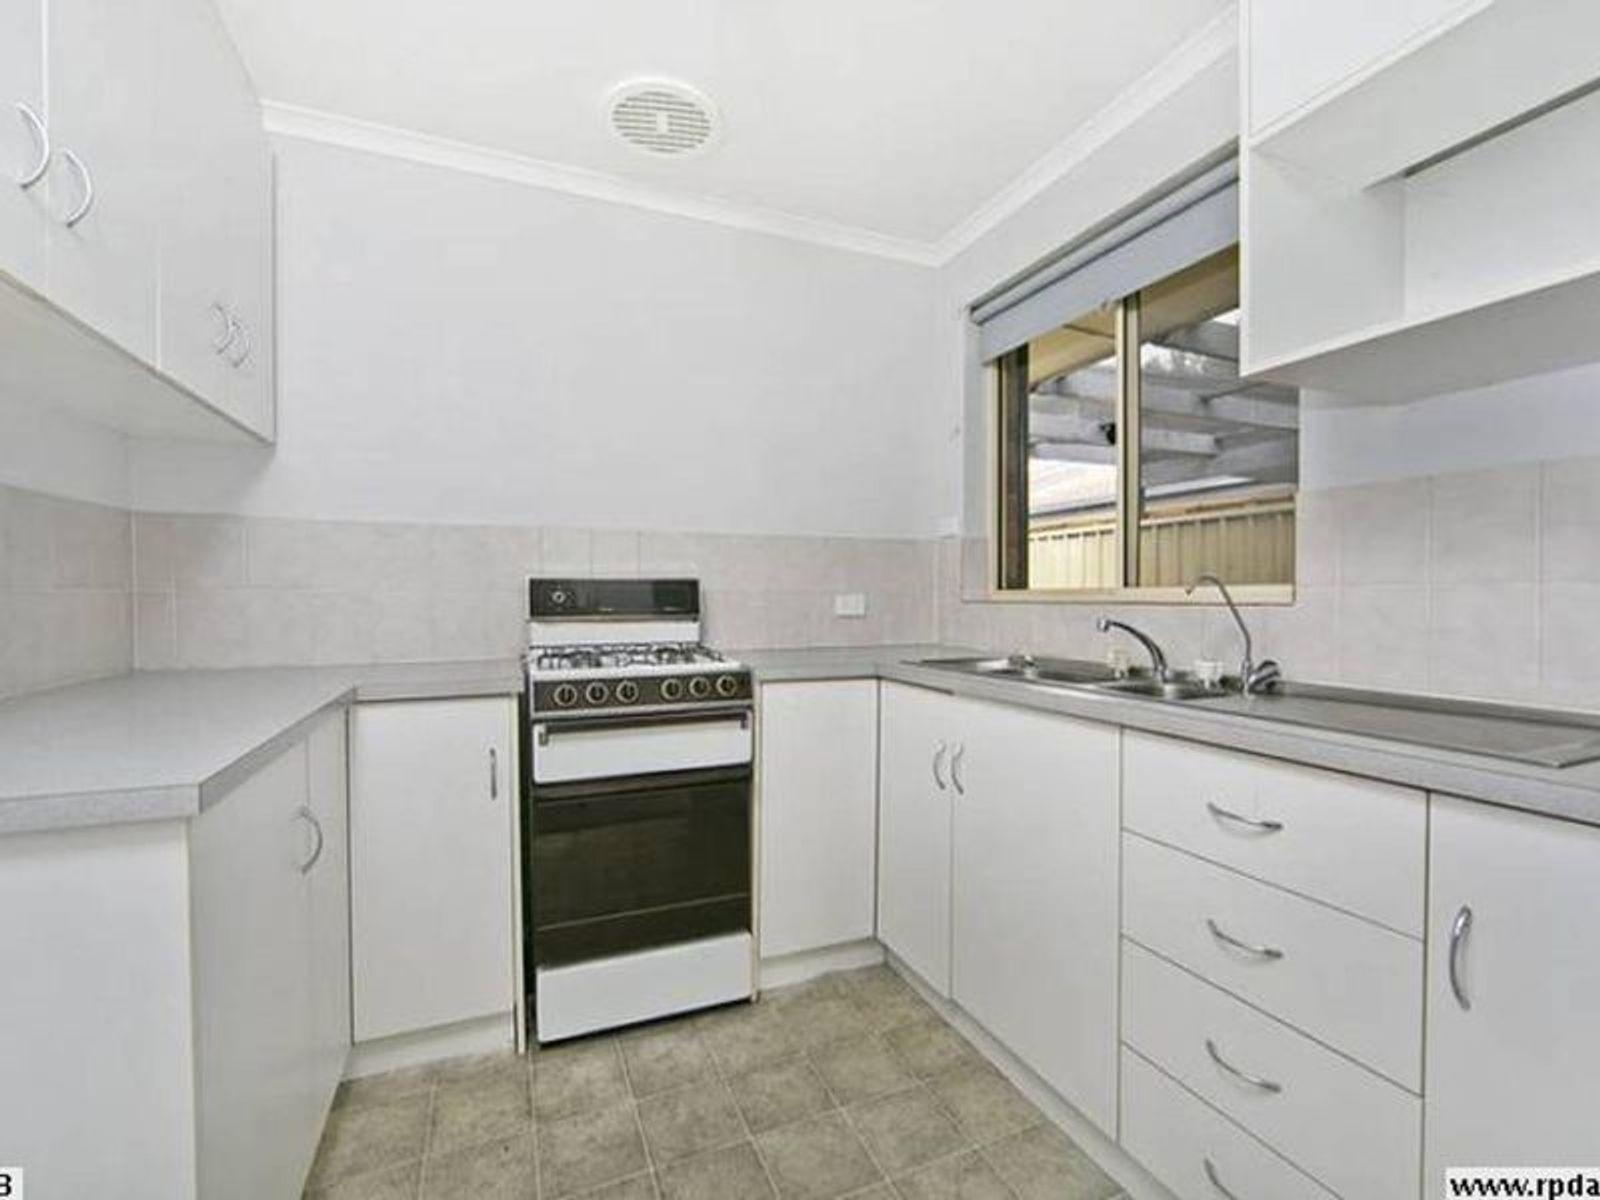 2/21 Hillrise Court, Wynn Vale, SA 5127